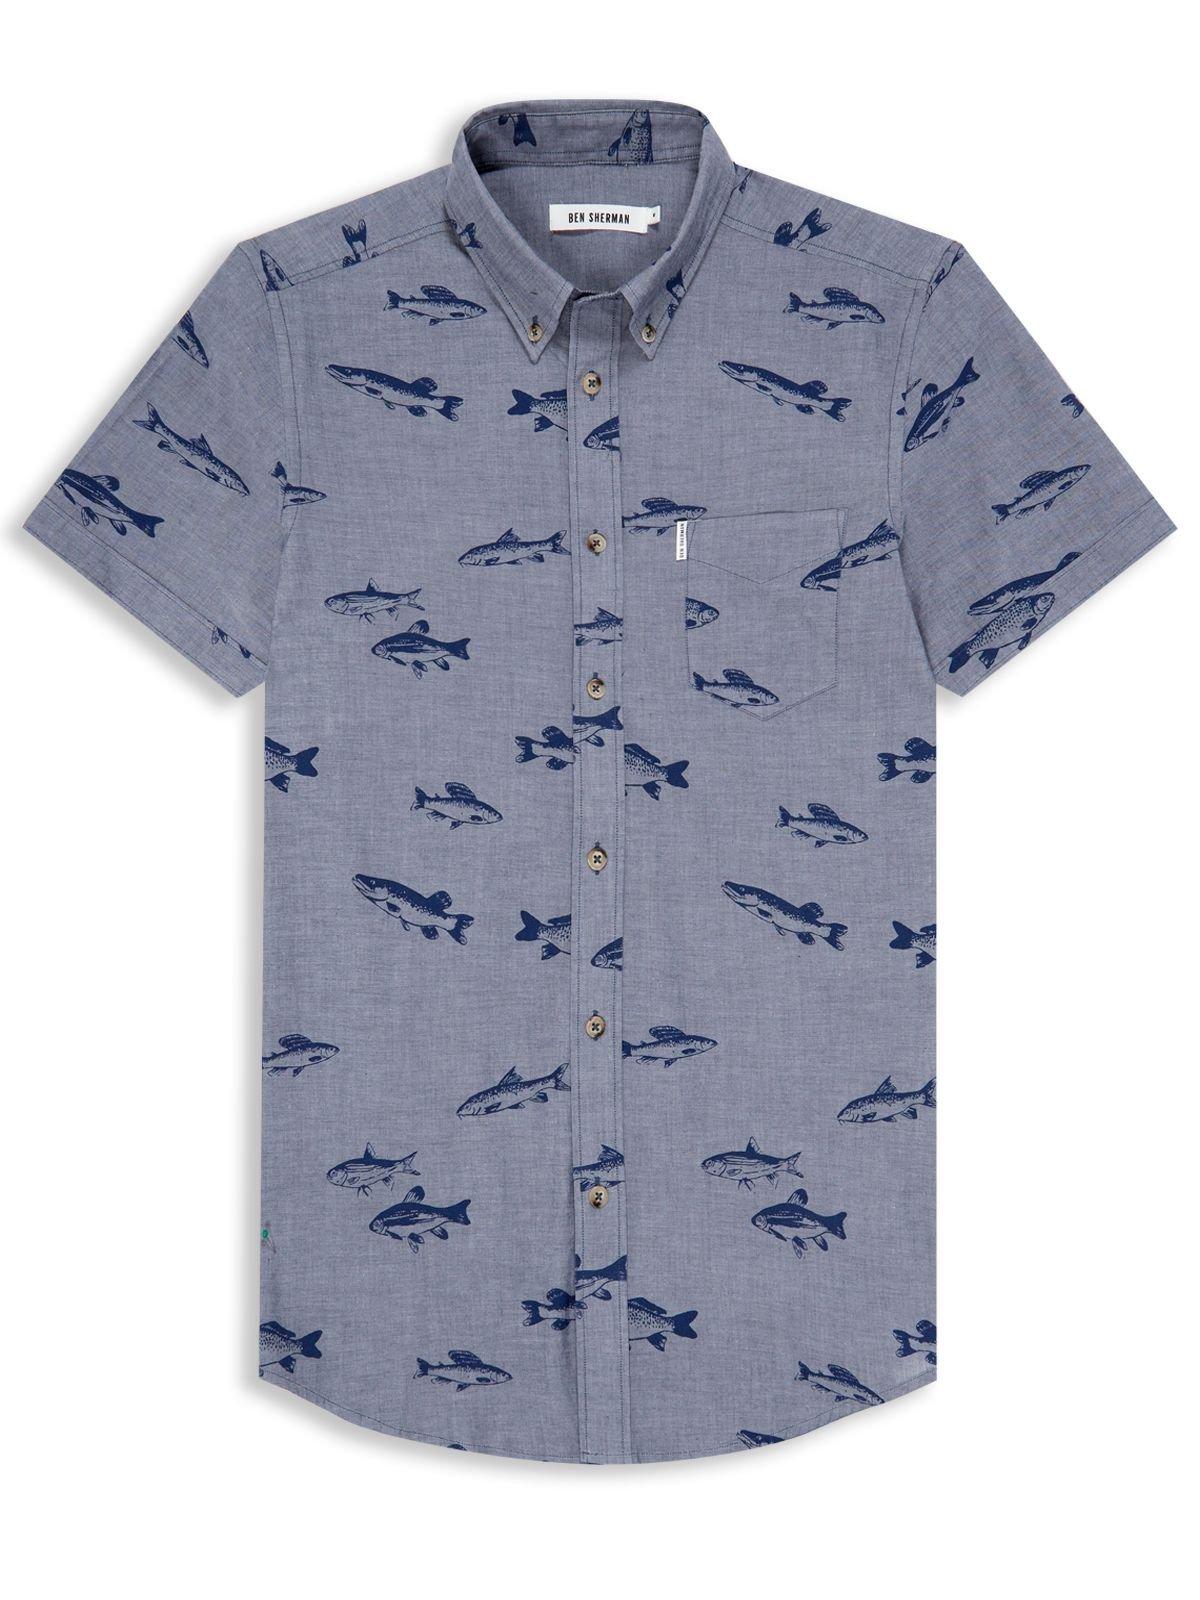 Ben Sherman Fish Print Shirt In Blue For Men Lyst